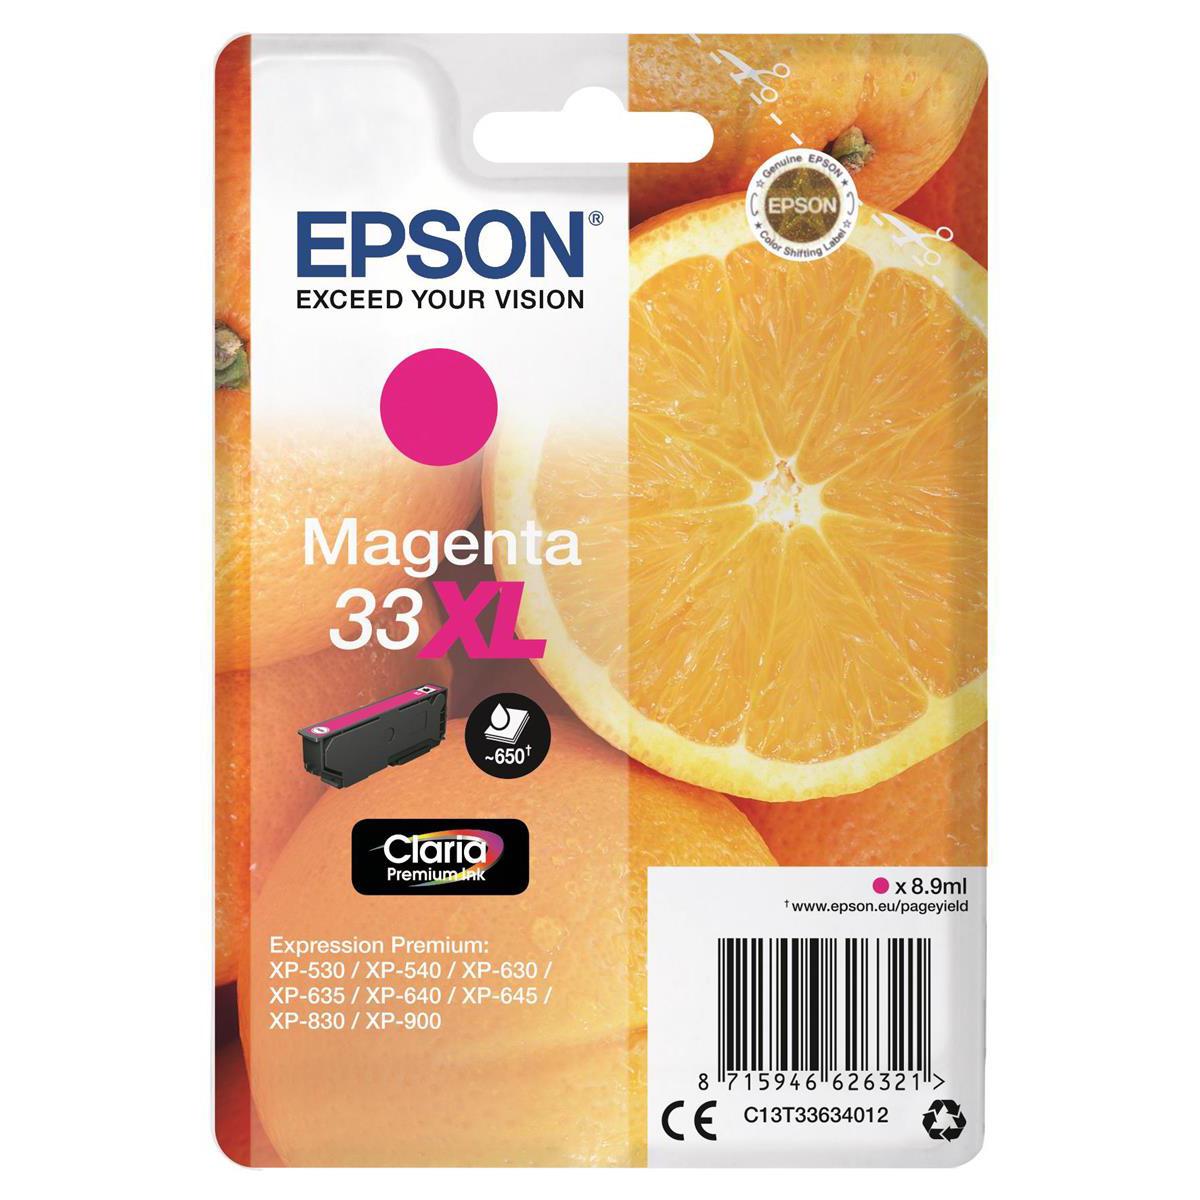 Inkjet Cartridges Epson T33XL Inkjet Cartridge Orange High Yield Page Life 650pp 8.9ml Magenta Ref C13T33634012